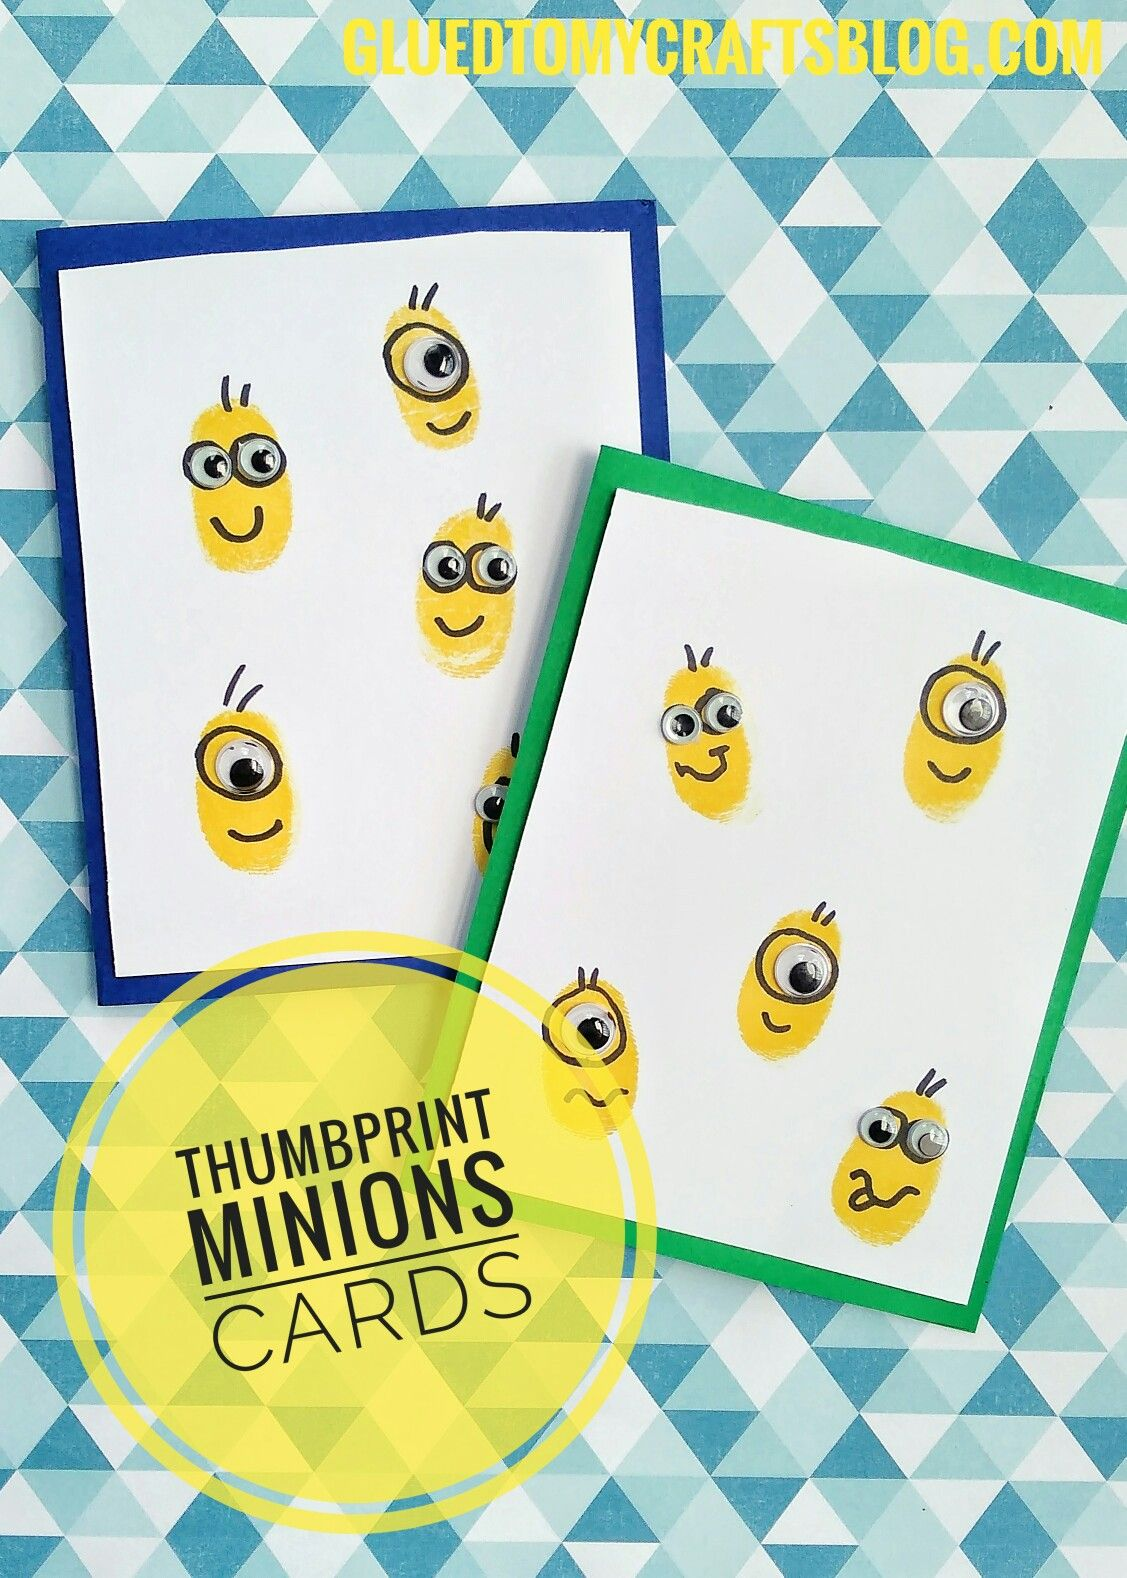 Thumbprint Minions Cards Despicable Me 3 Minion Card Minion